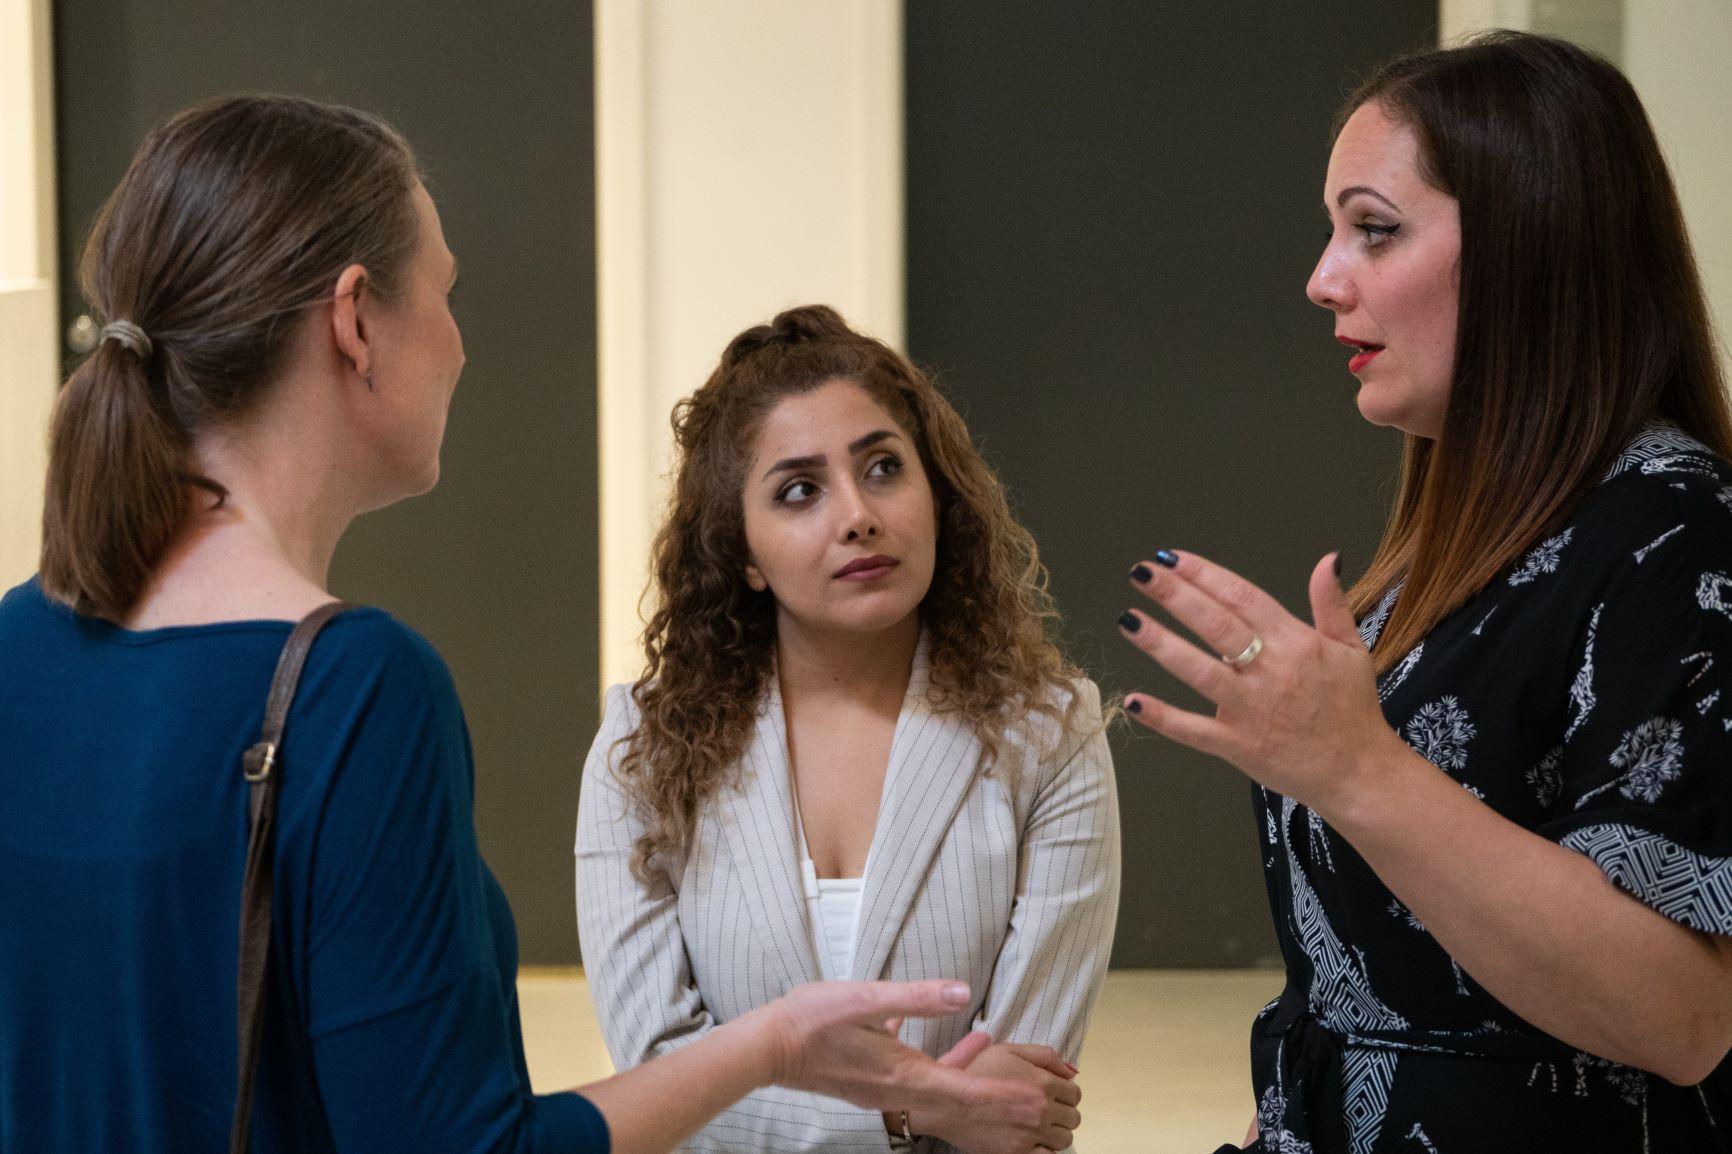 Women in STEM - development and career opportunities